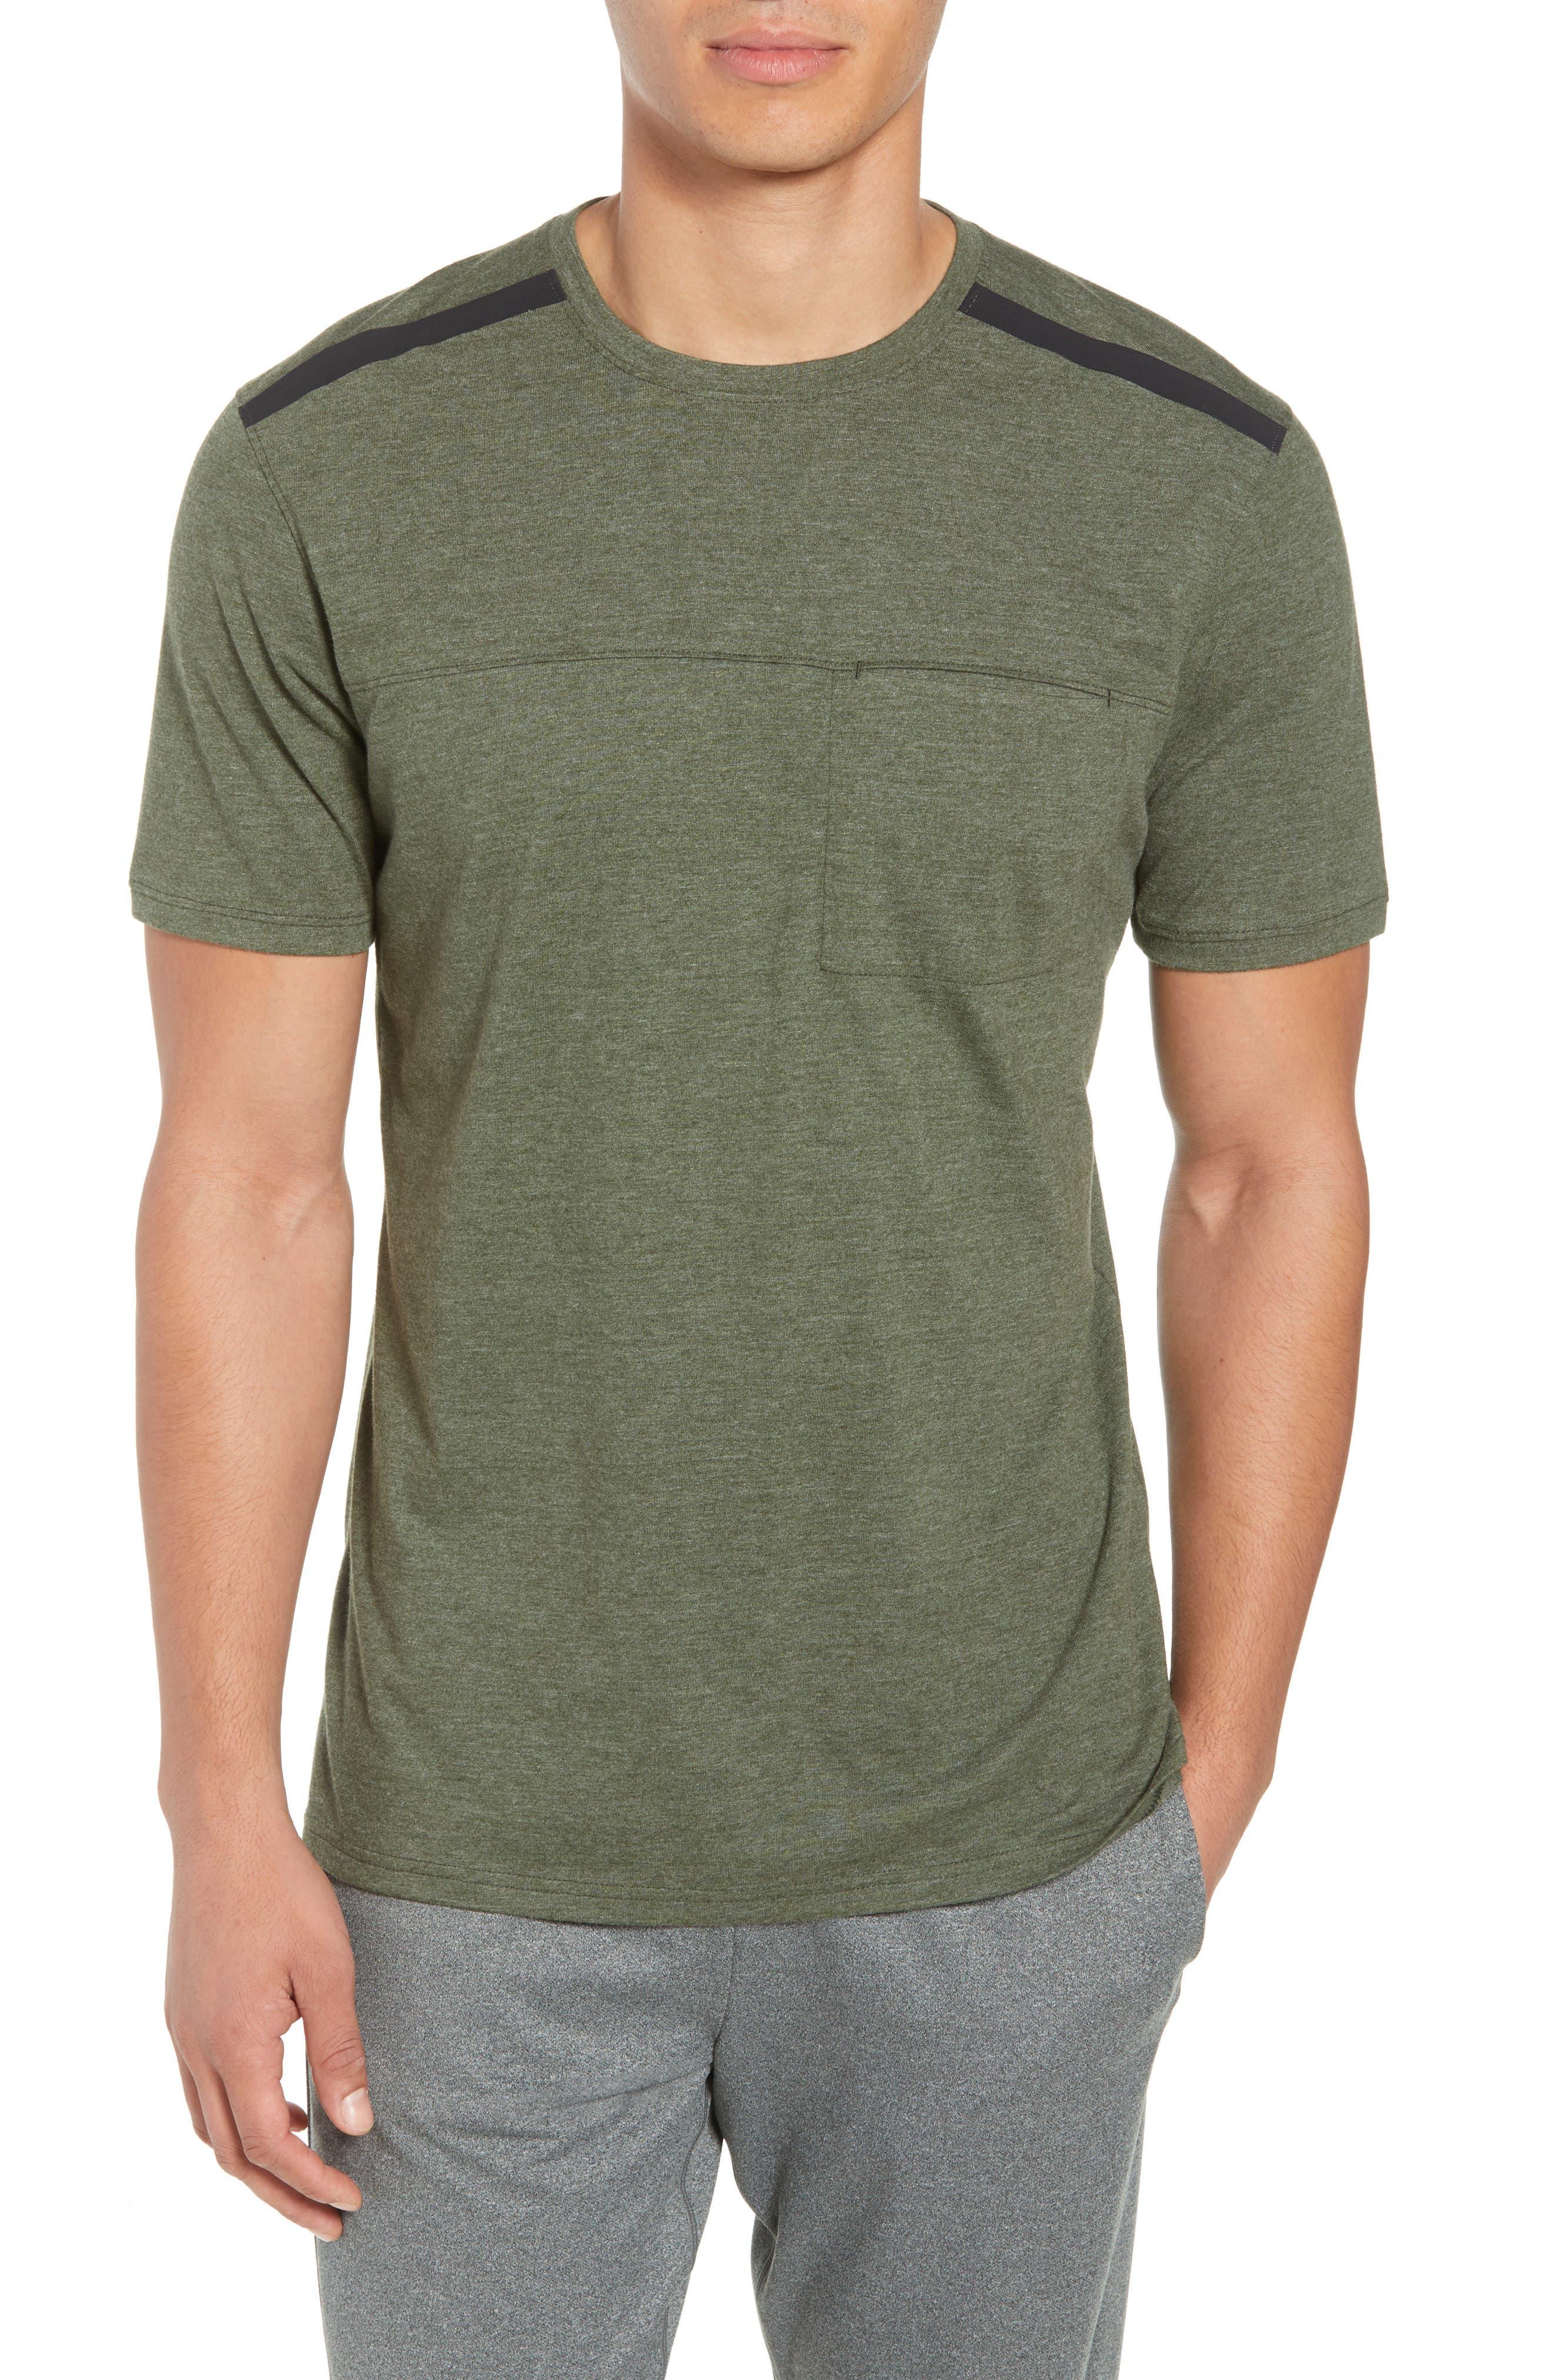 Perfomance T-Shirt,                             Main thumbnail 1, color,                             GREEN TACTICAL MELANGE